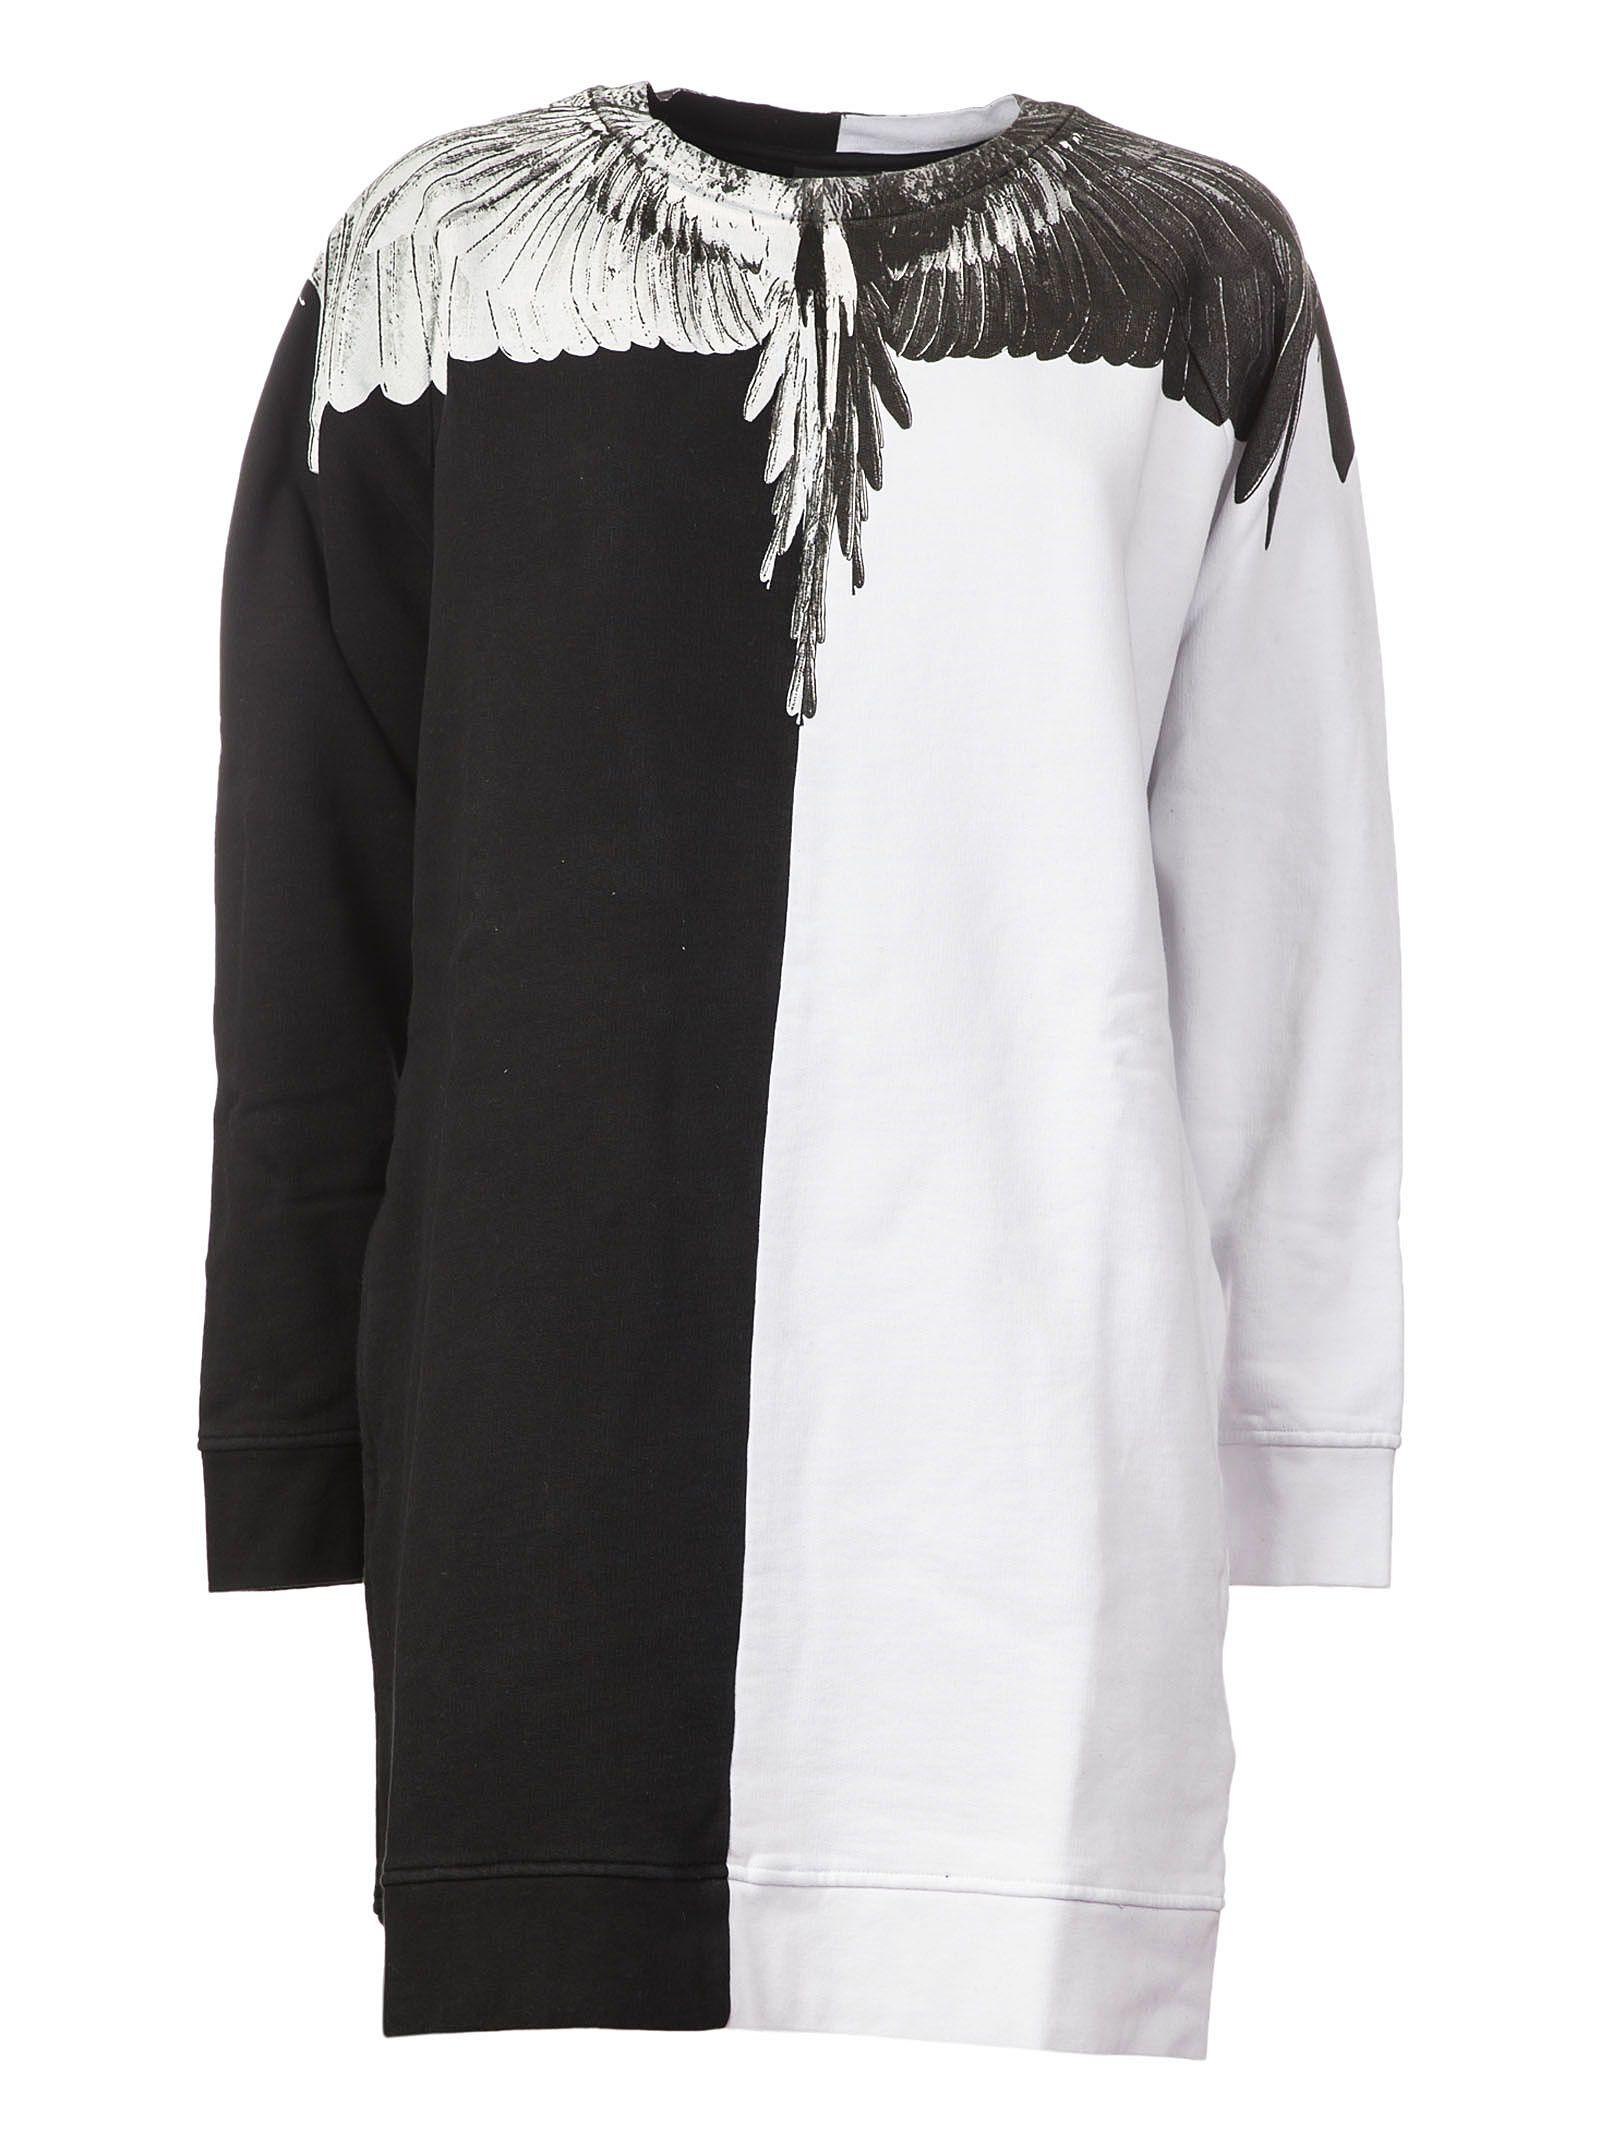 Marcelo Burlon Sweatshirt Dress